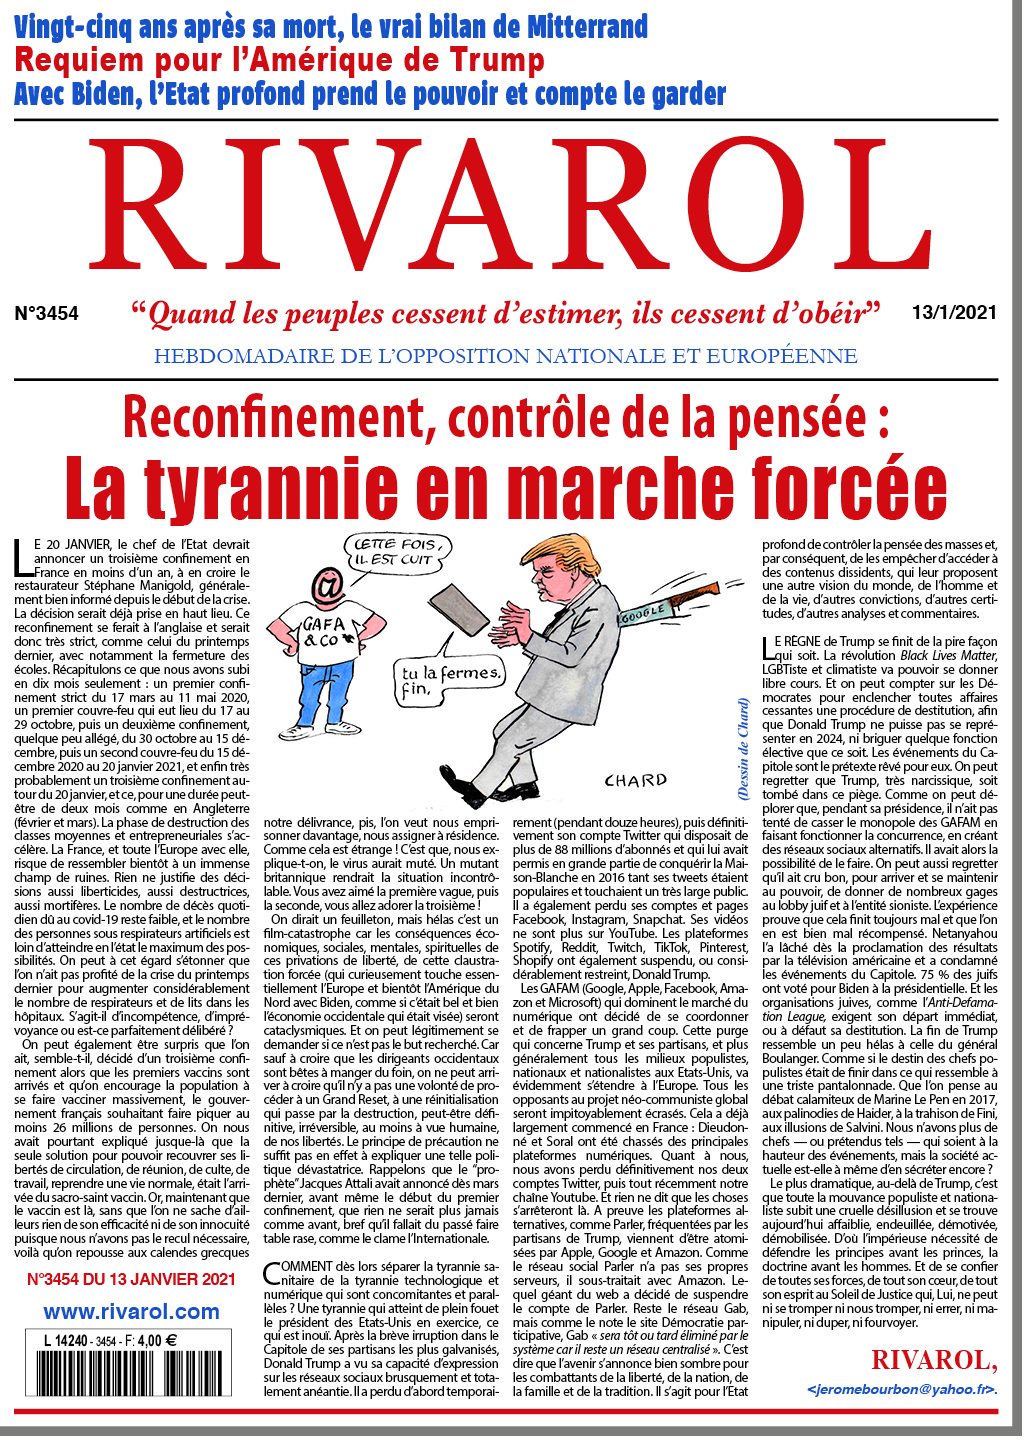 Rivarol n°3454 du 13/1/2021